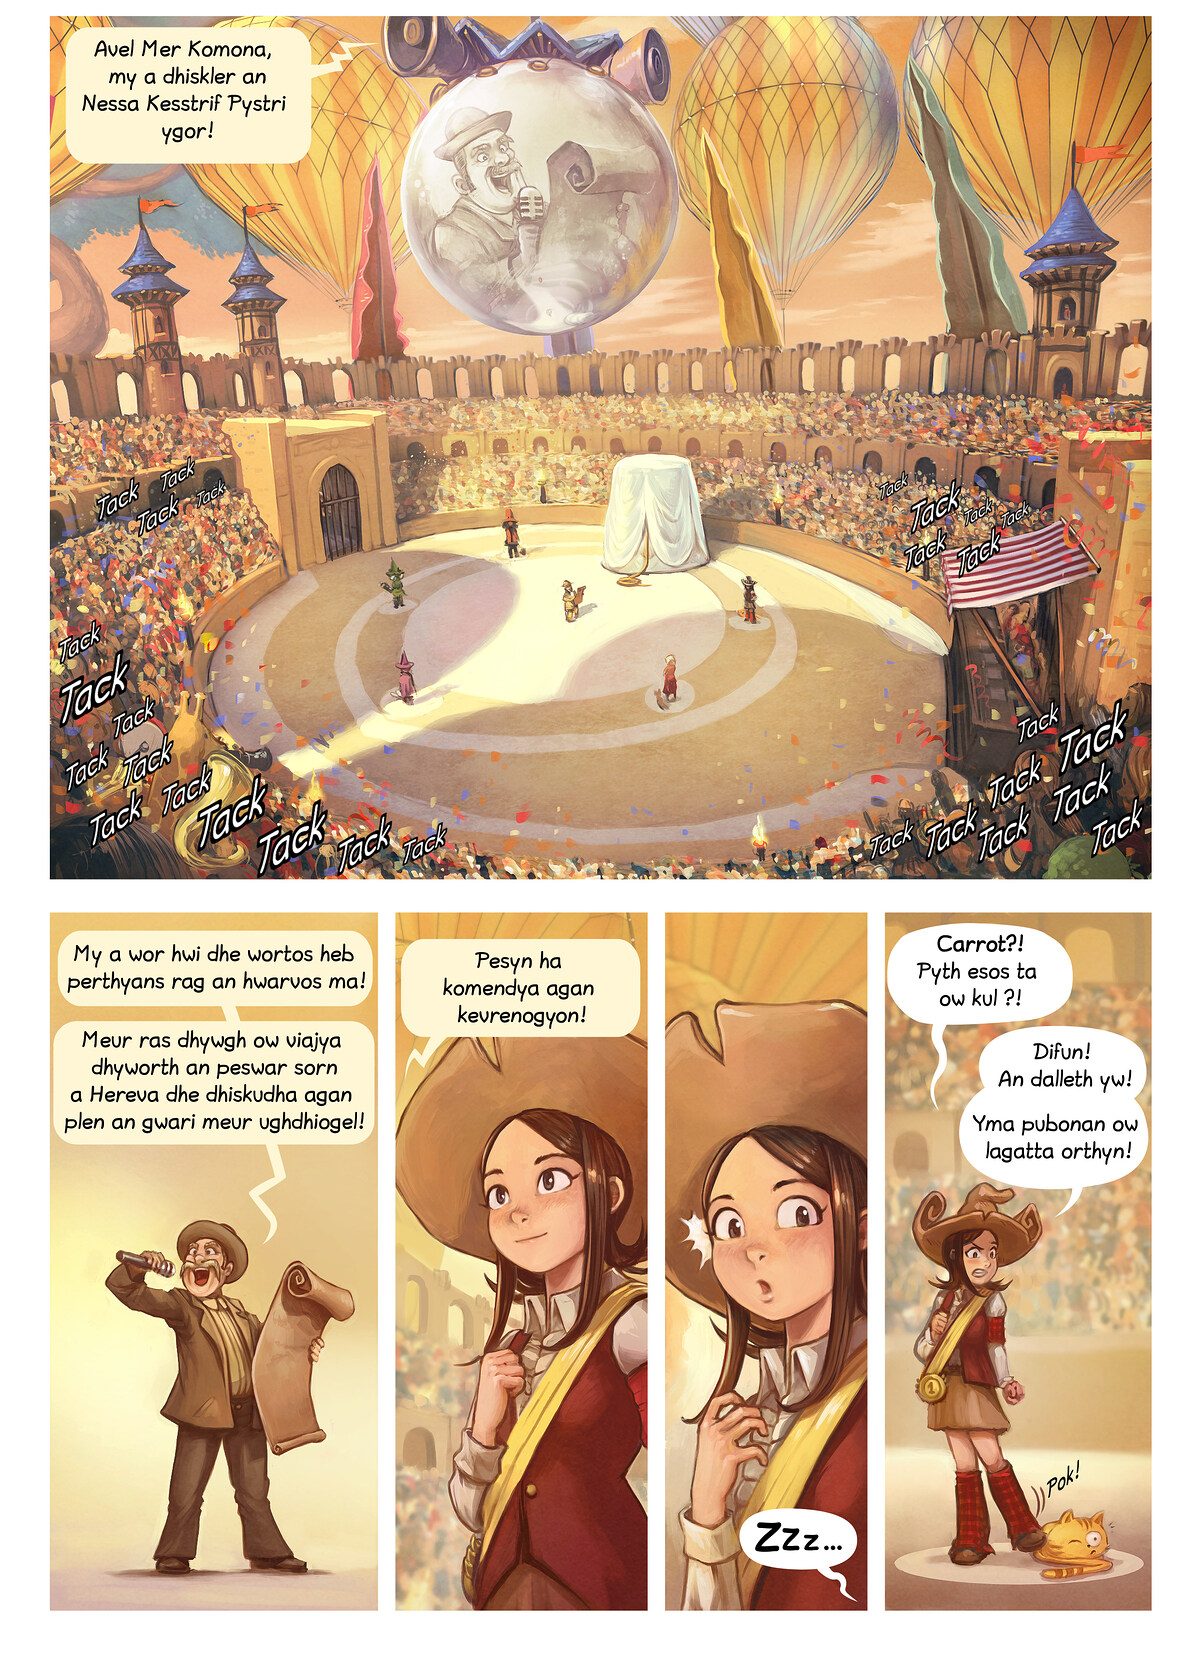 Rann 21: An Kesstrif Pystri, Page 3